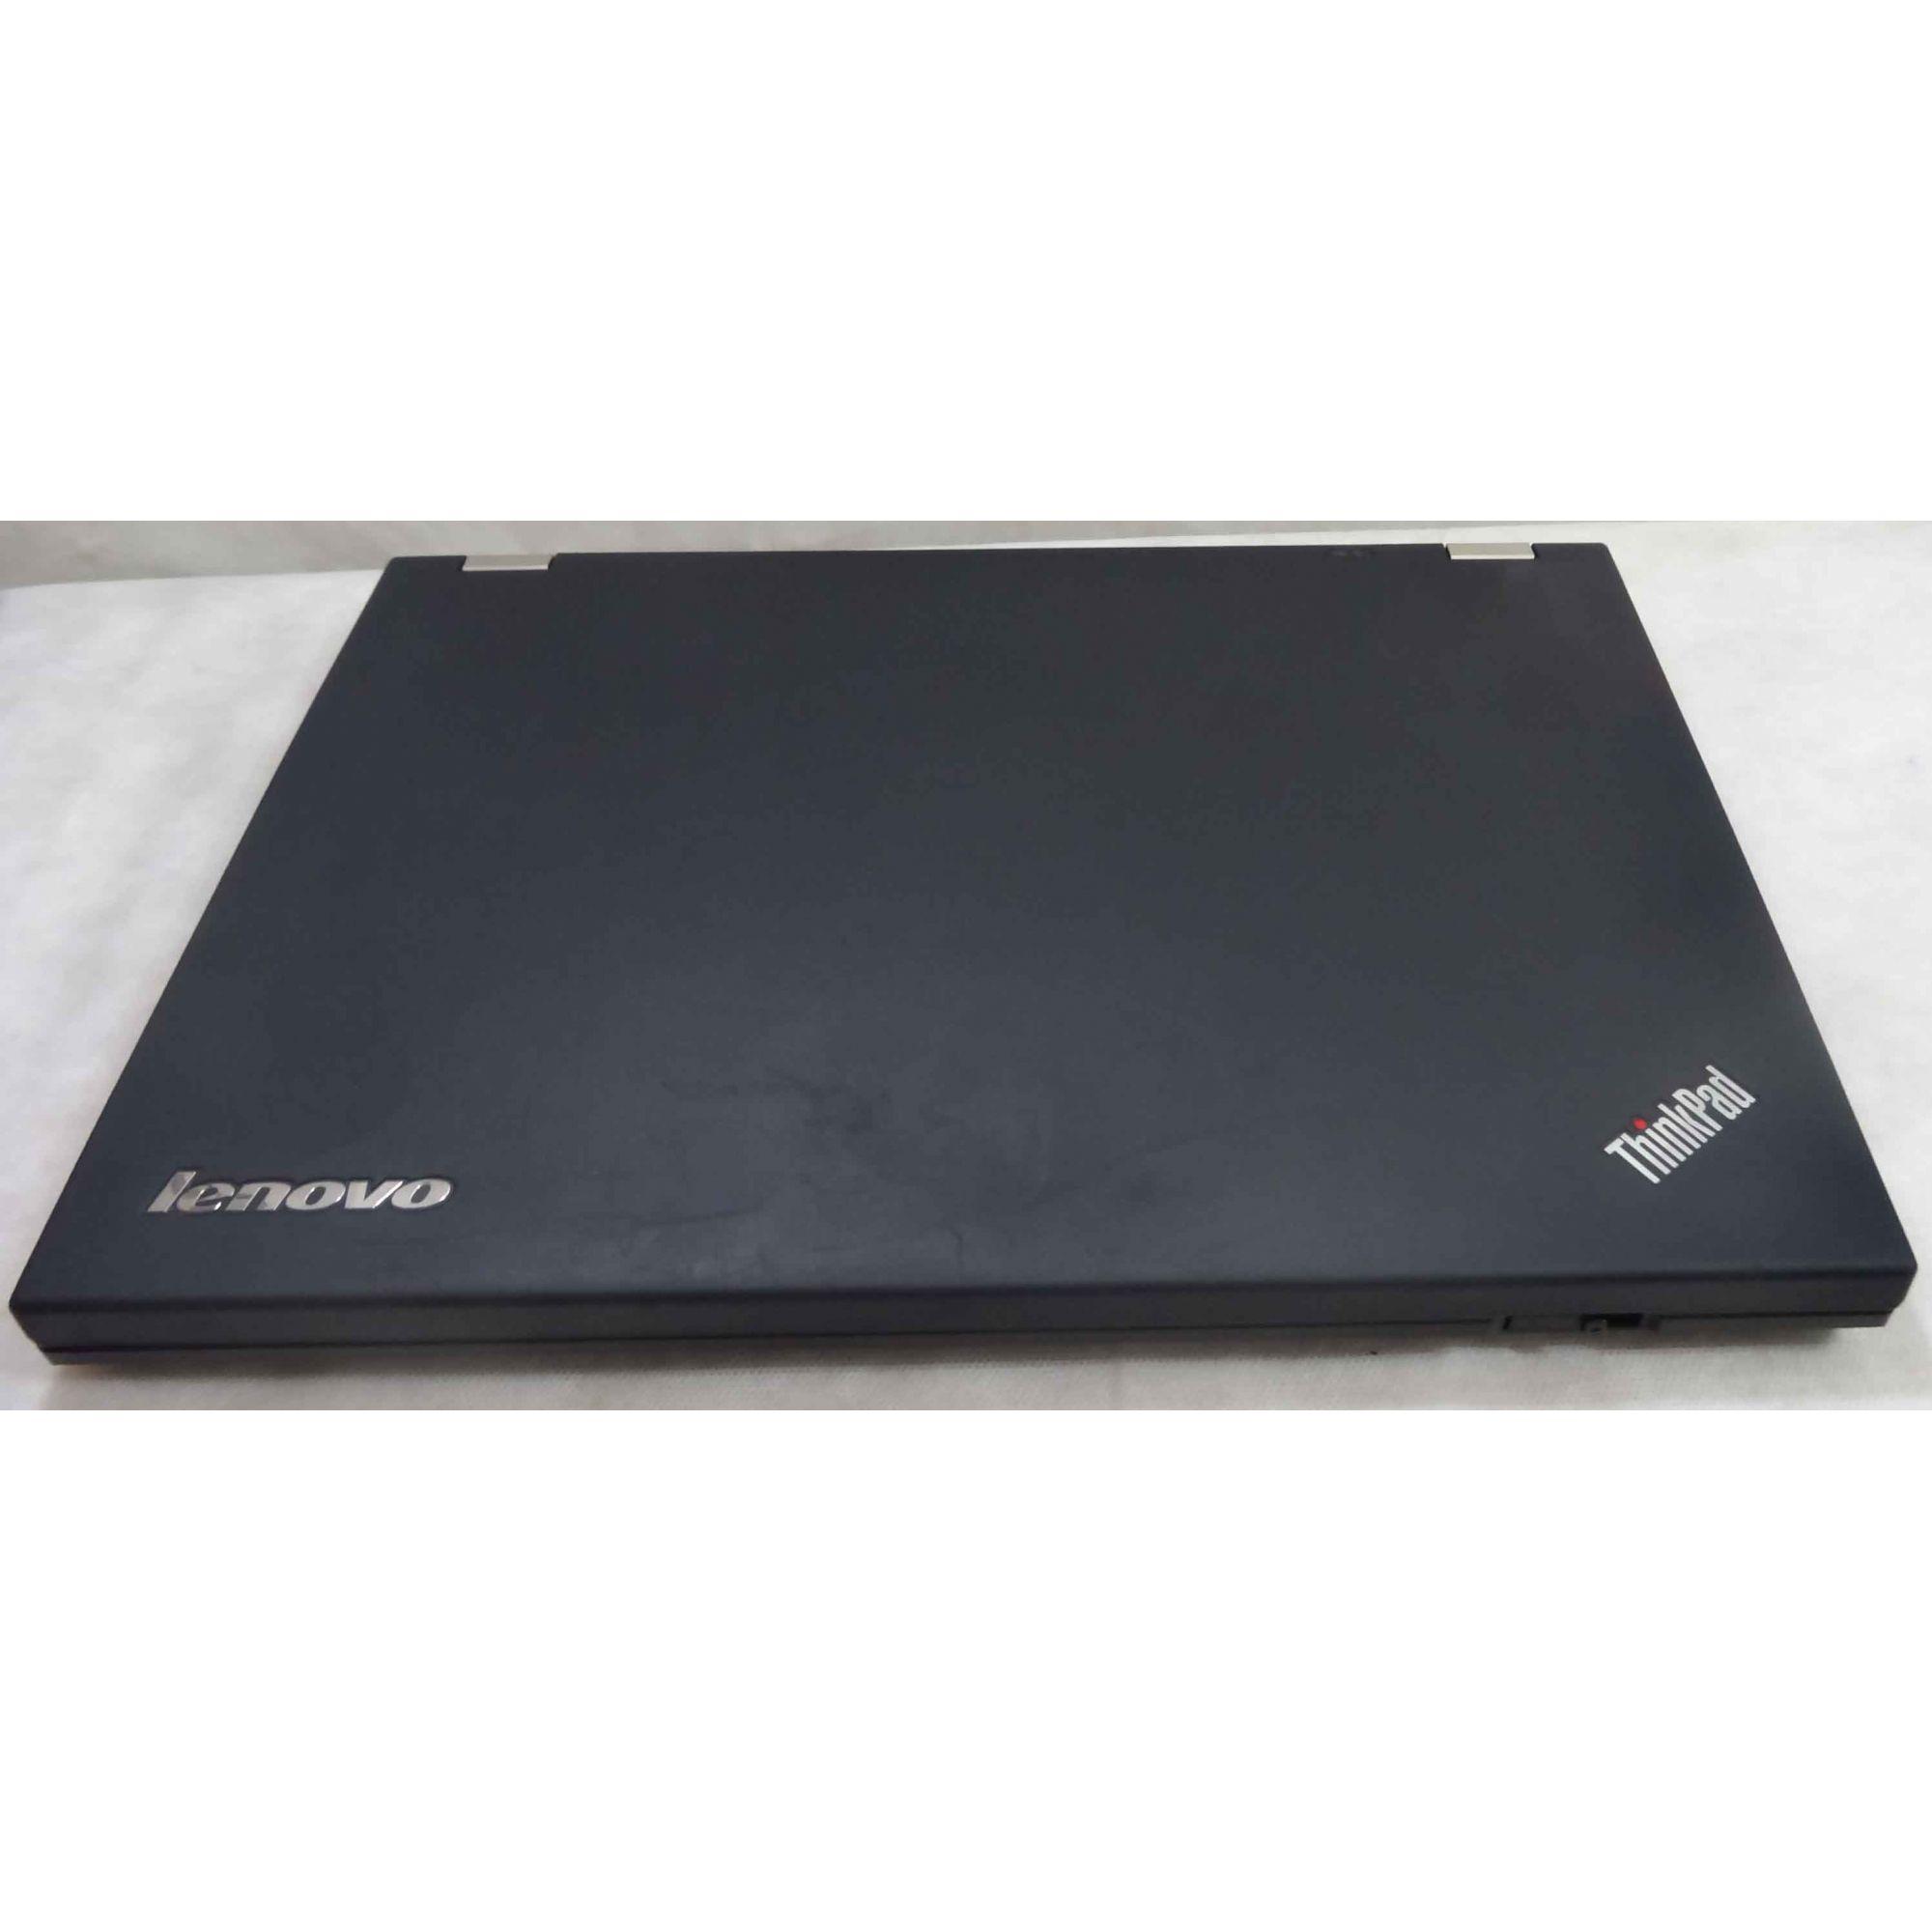 Notebook Lenovo Thinkpad T430 Intel Core i5 2.6GHz 4GB HD-320GB